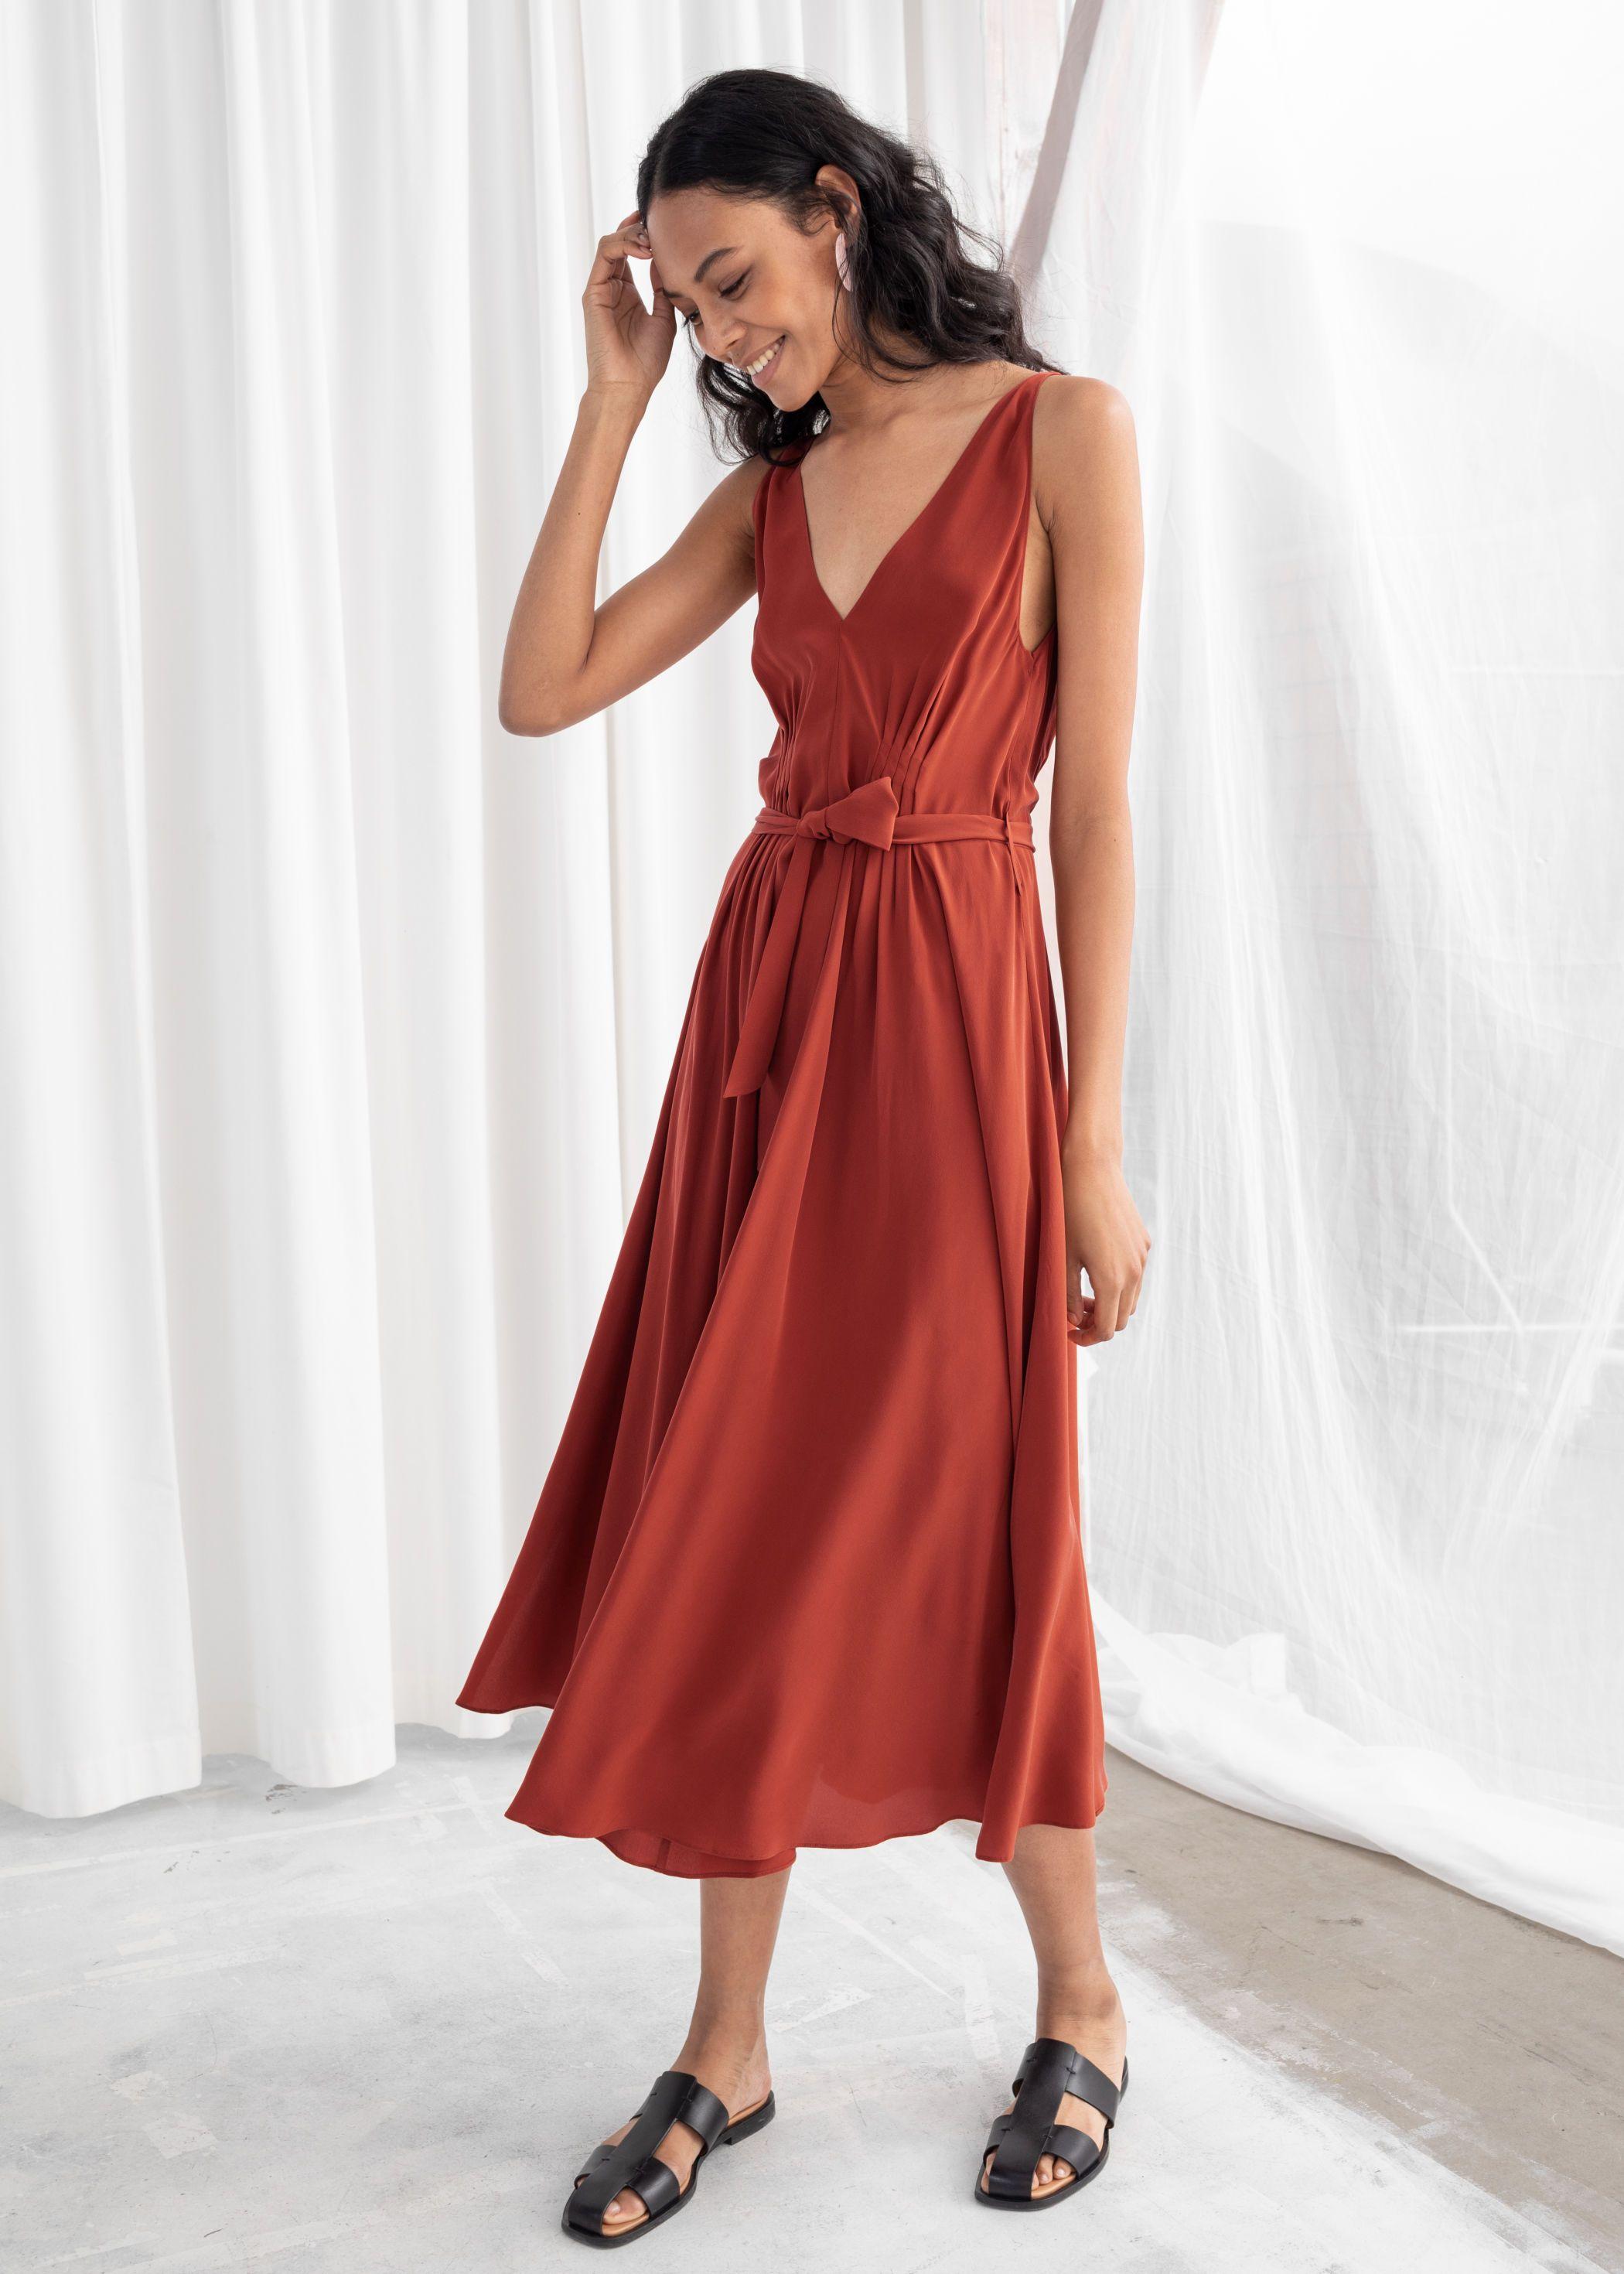 62588cbec5d5 Belted Silk Midi Dress - Rust - Midi dresses -   Other Stories ...